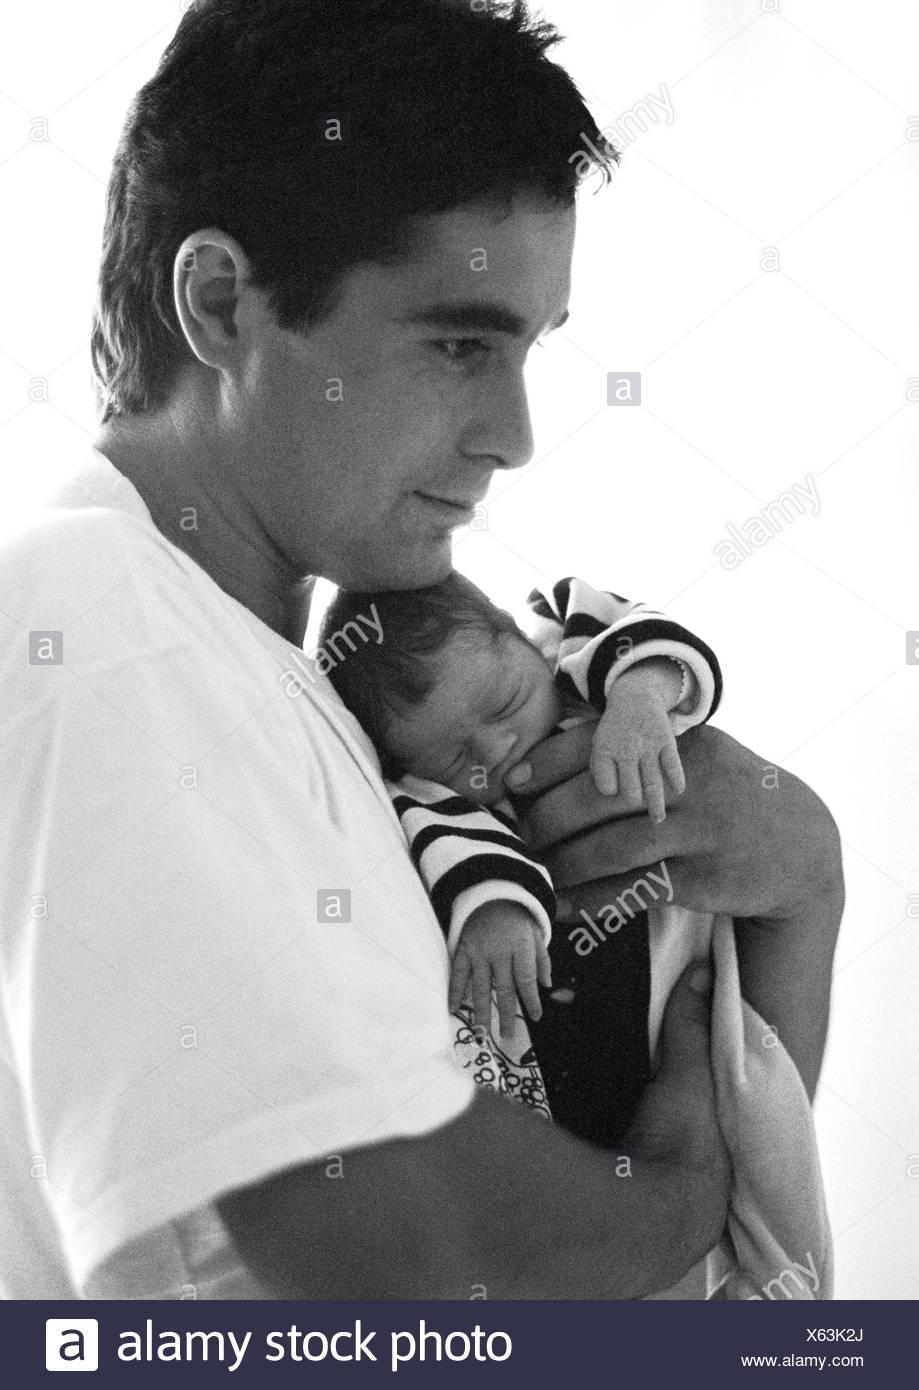 Man hugging baby, side view, b&w - Stock Image